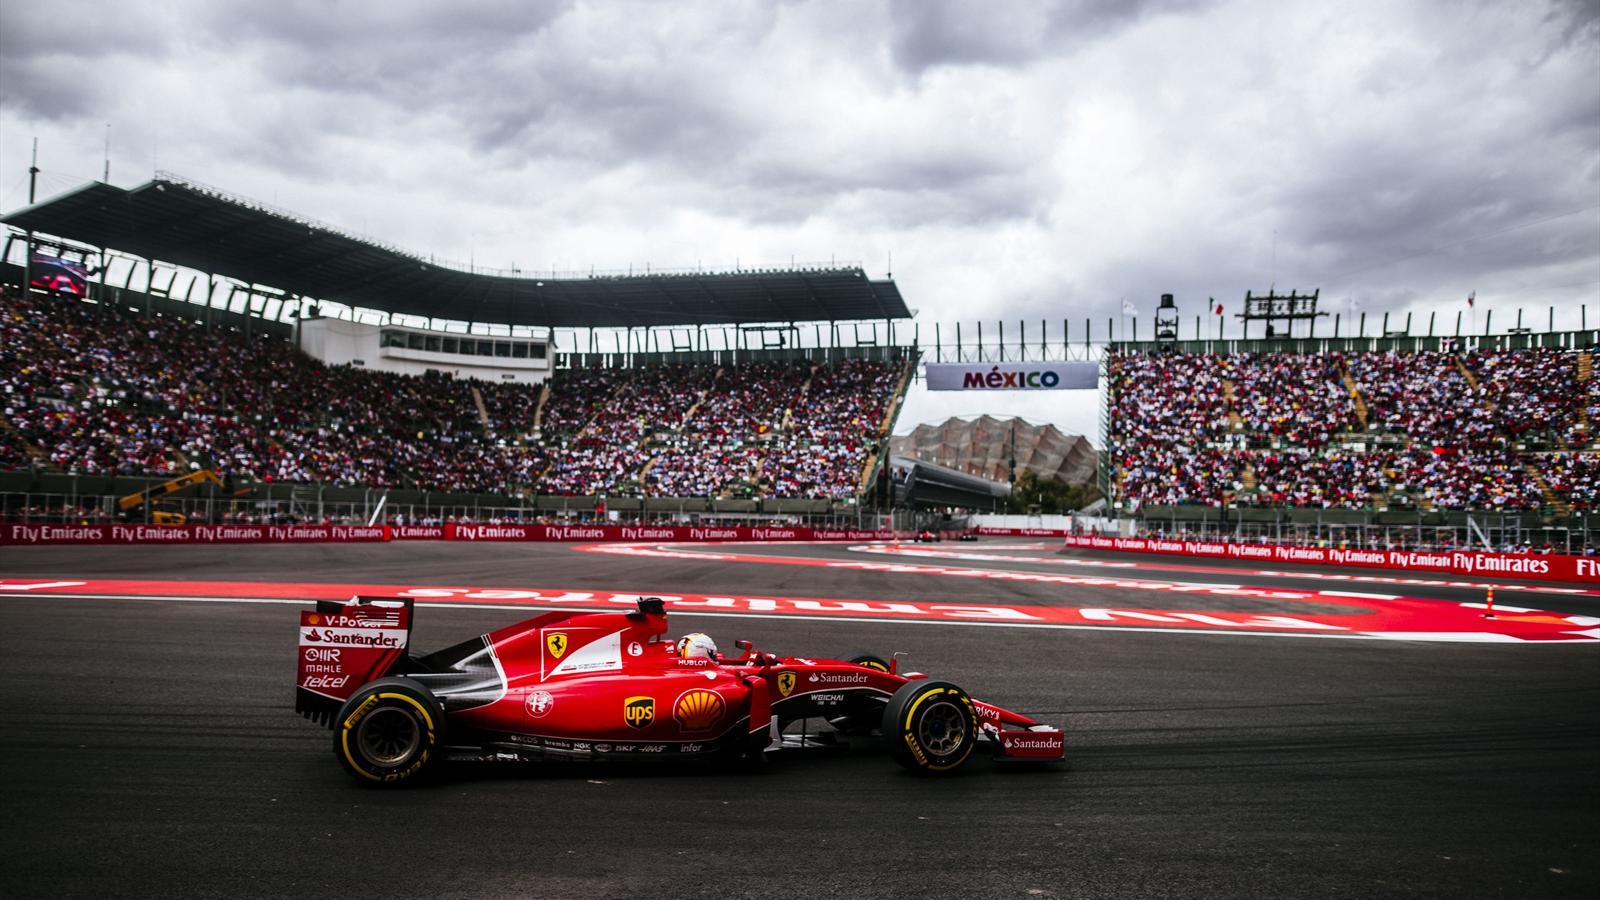 Sebastian Vettel (Ferrari) - GP of Mexico 2015